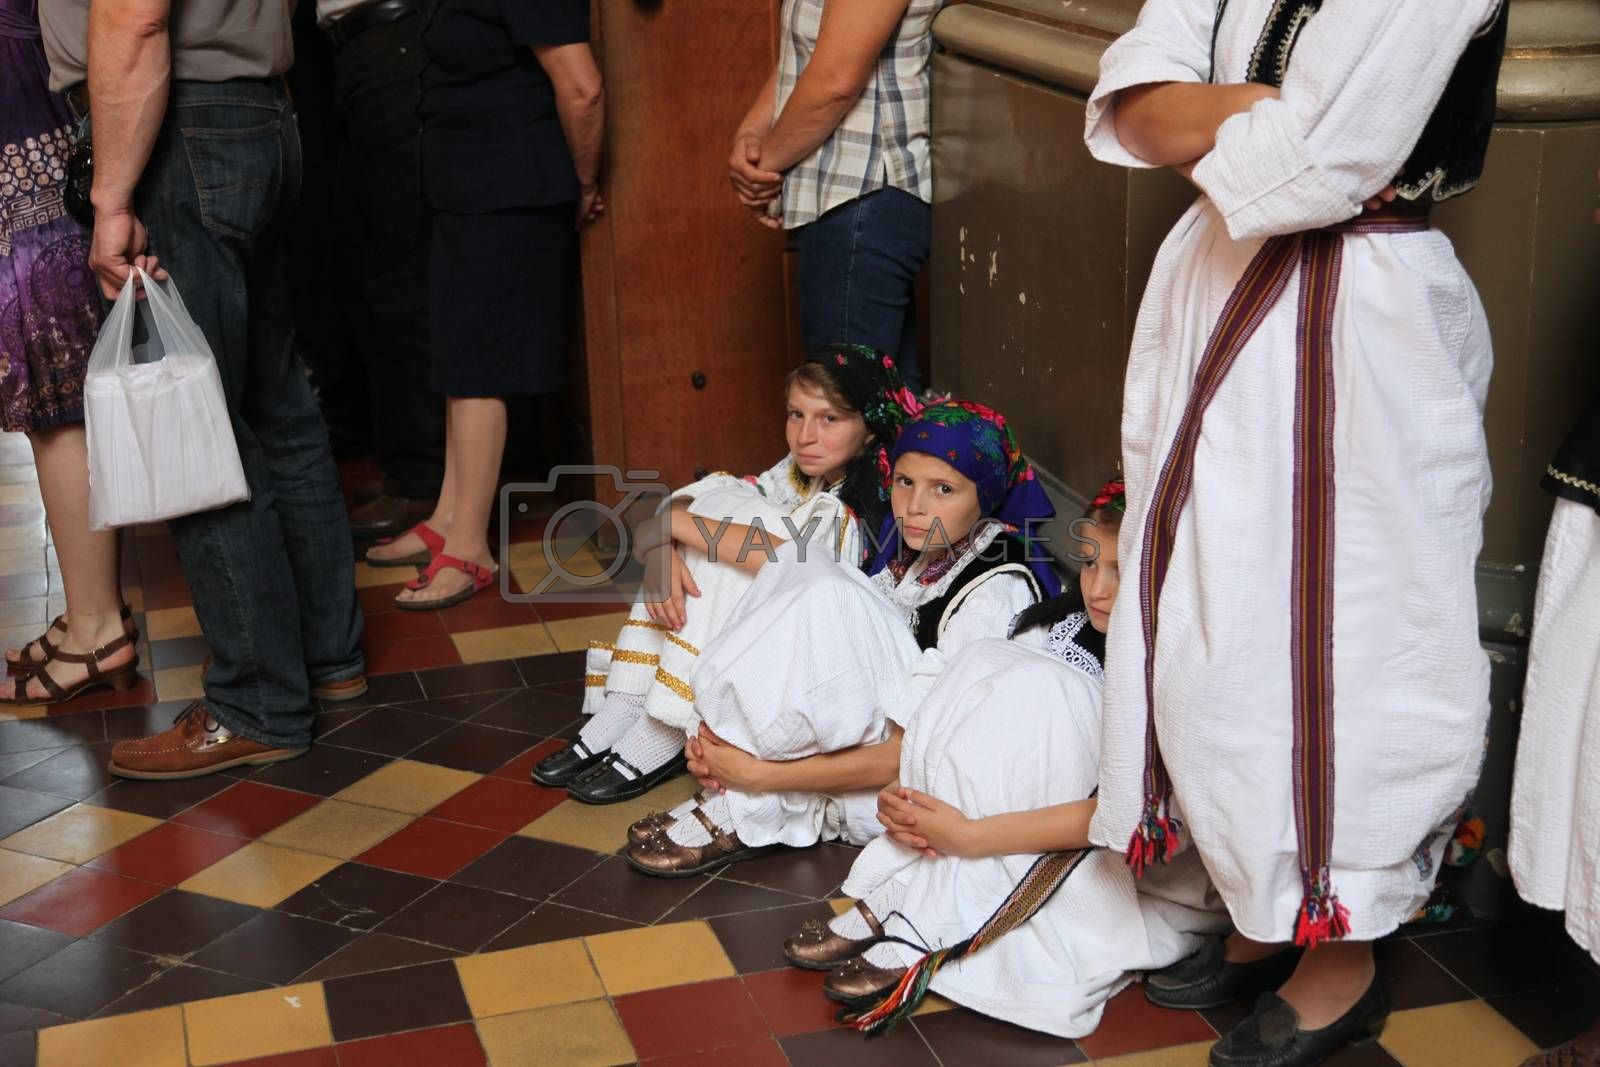 Unidentified participant in Croatian national costume on the Sunday Mass, during the Dakovacki vezovi (Dakovo Summer Festival) on July 05, 2009 in Dakovo, Croatia.